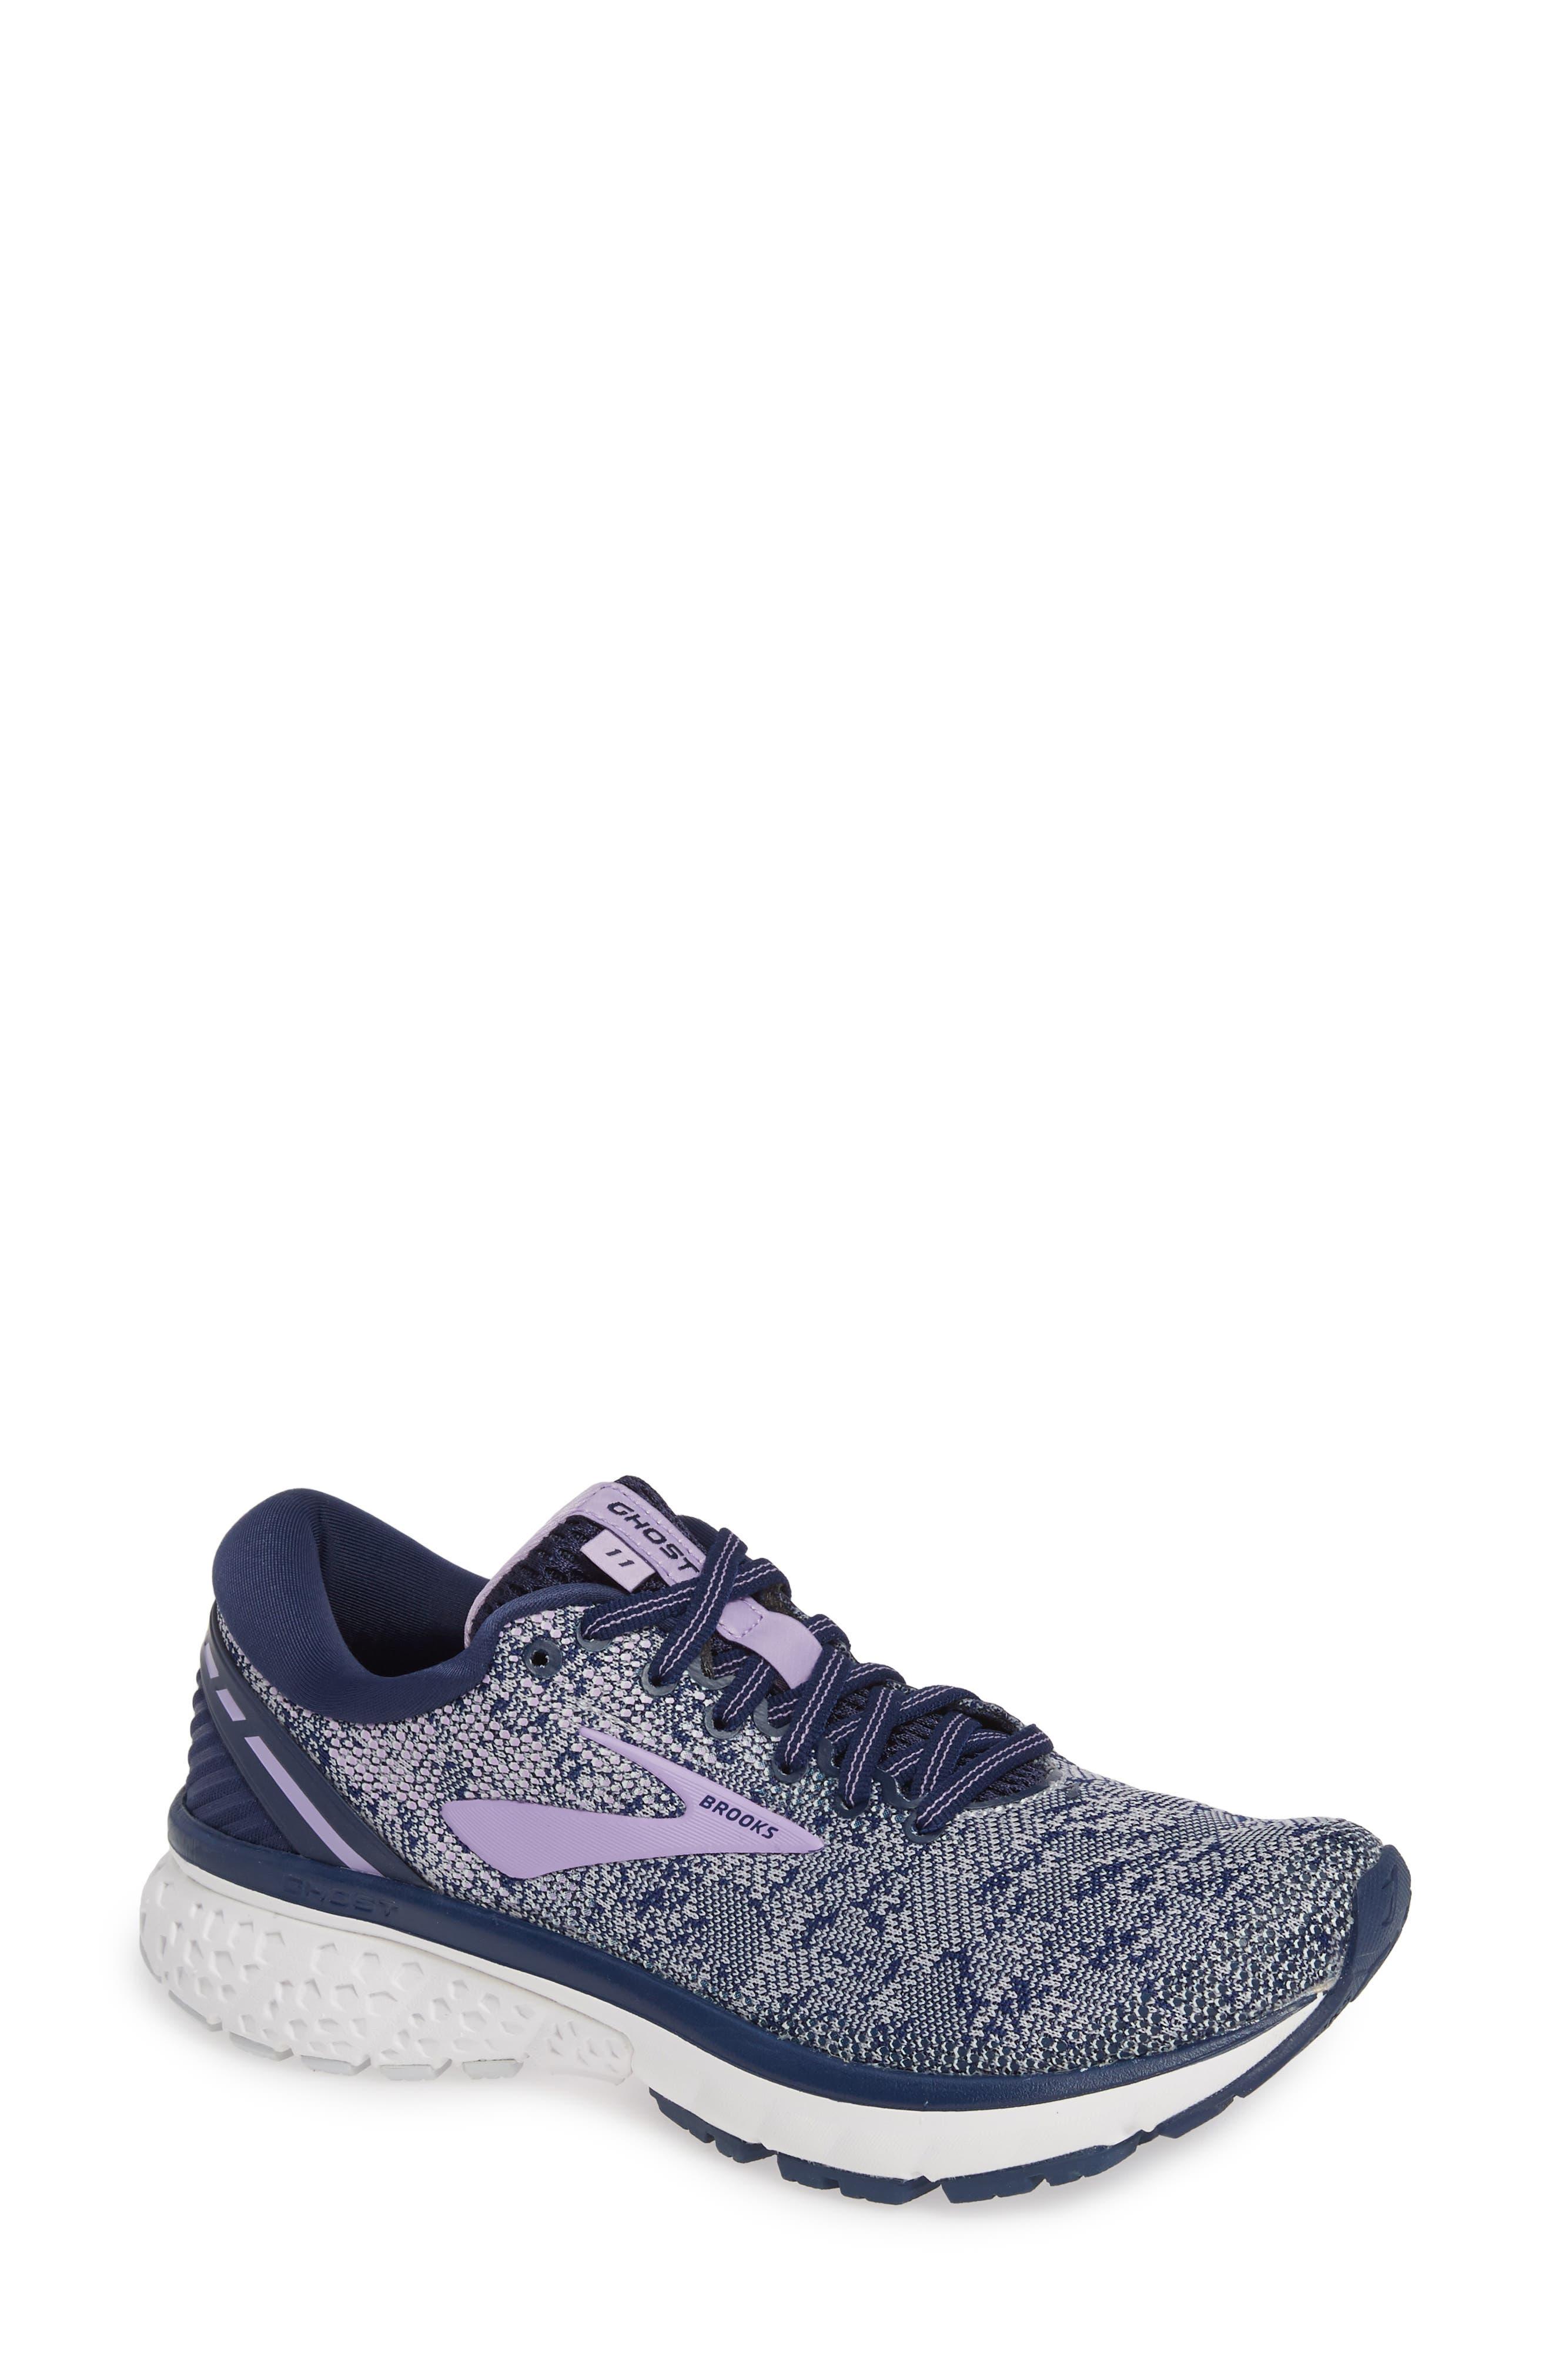 Ghost 11 Running Shoe in Navy/ Grey/ Purple Rose